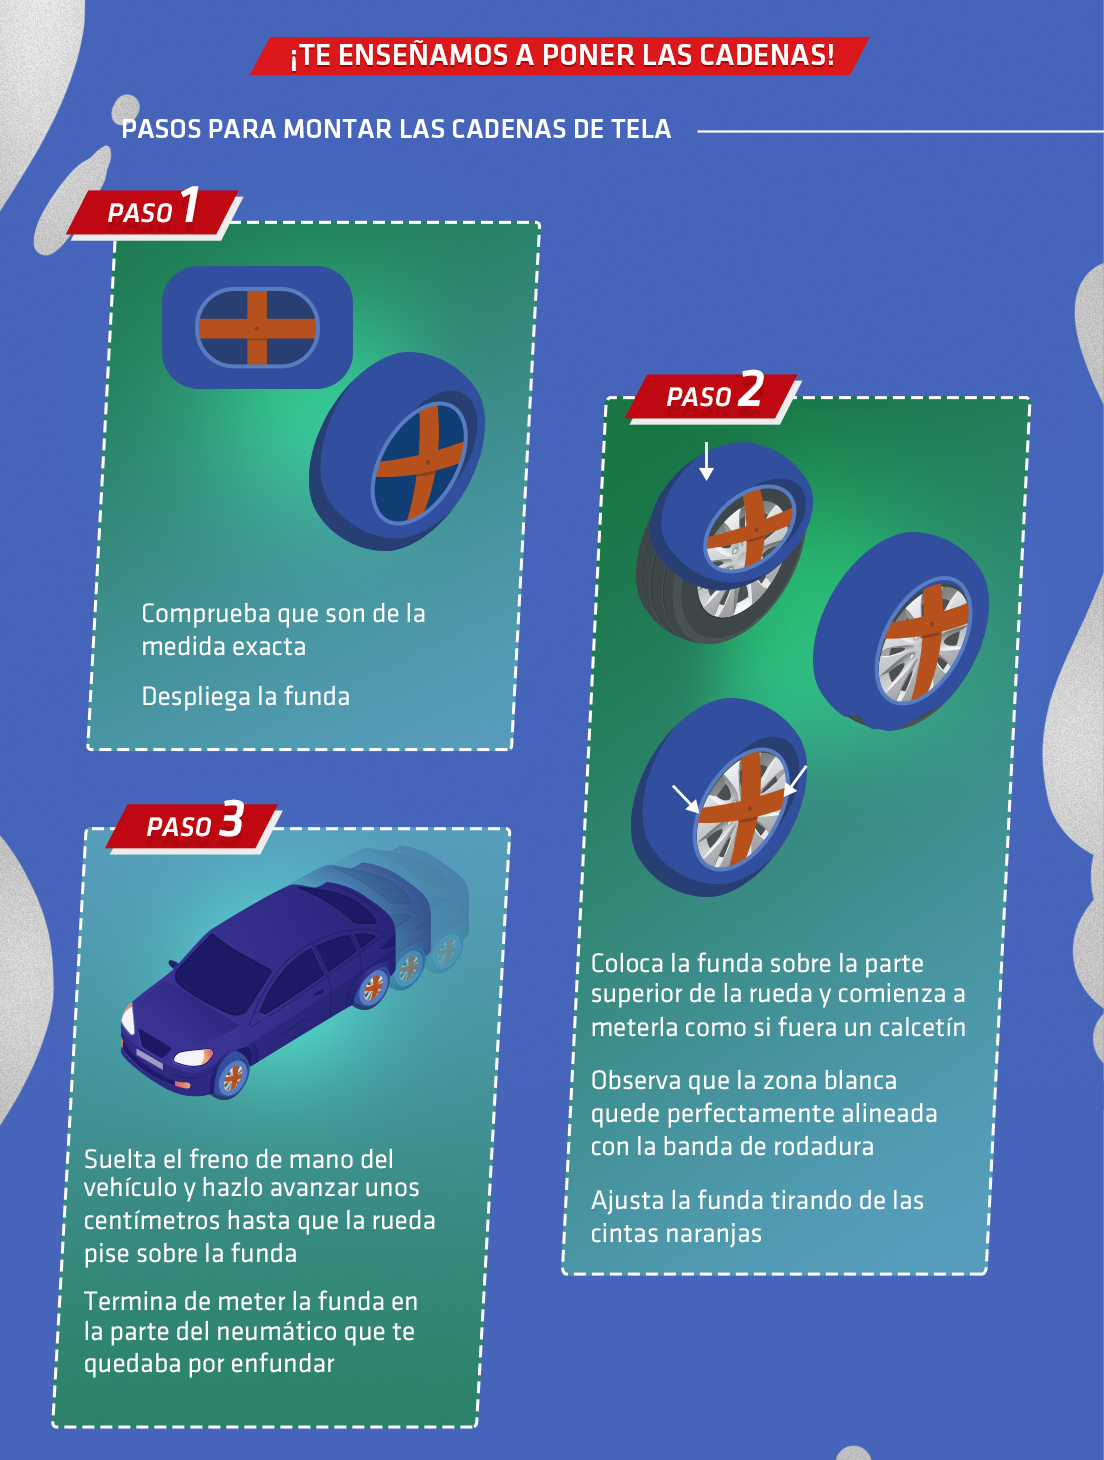 Infografía sobre como poner cadenas de tela